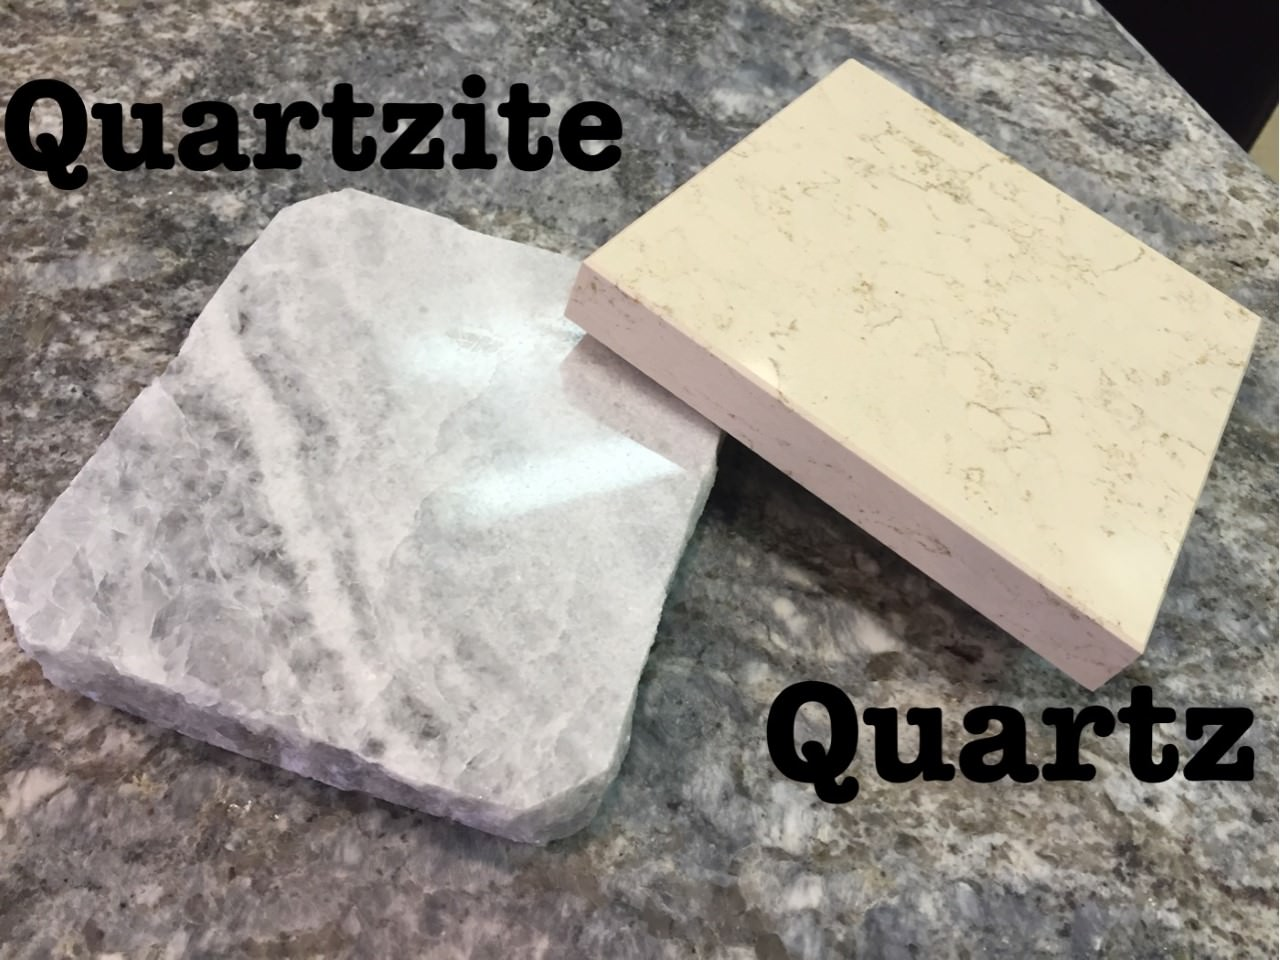 The Difference Between Quartz & Quartzite